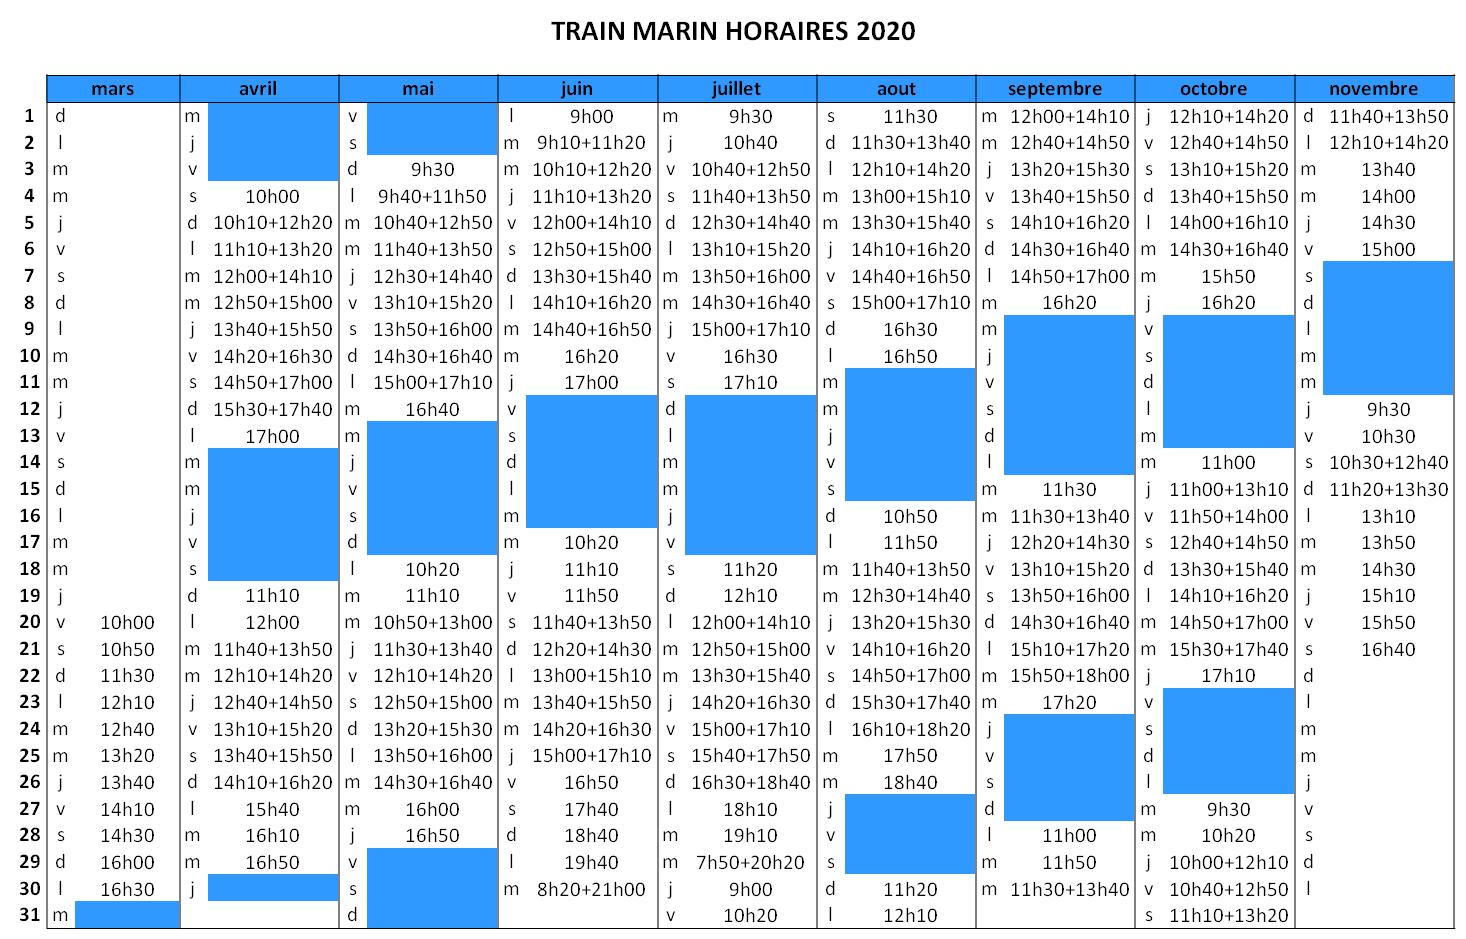 Horaires Train Marin 2019